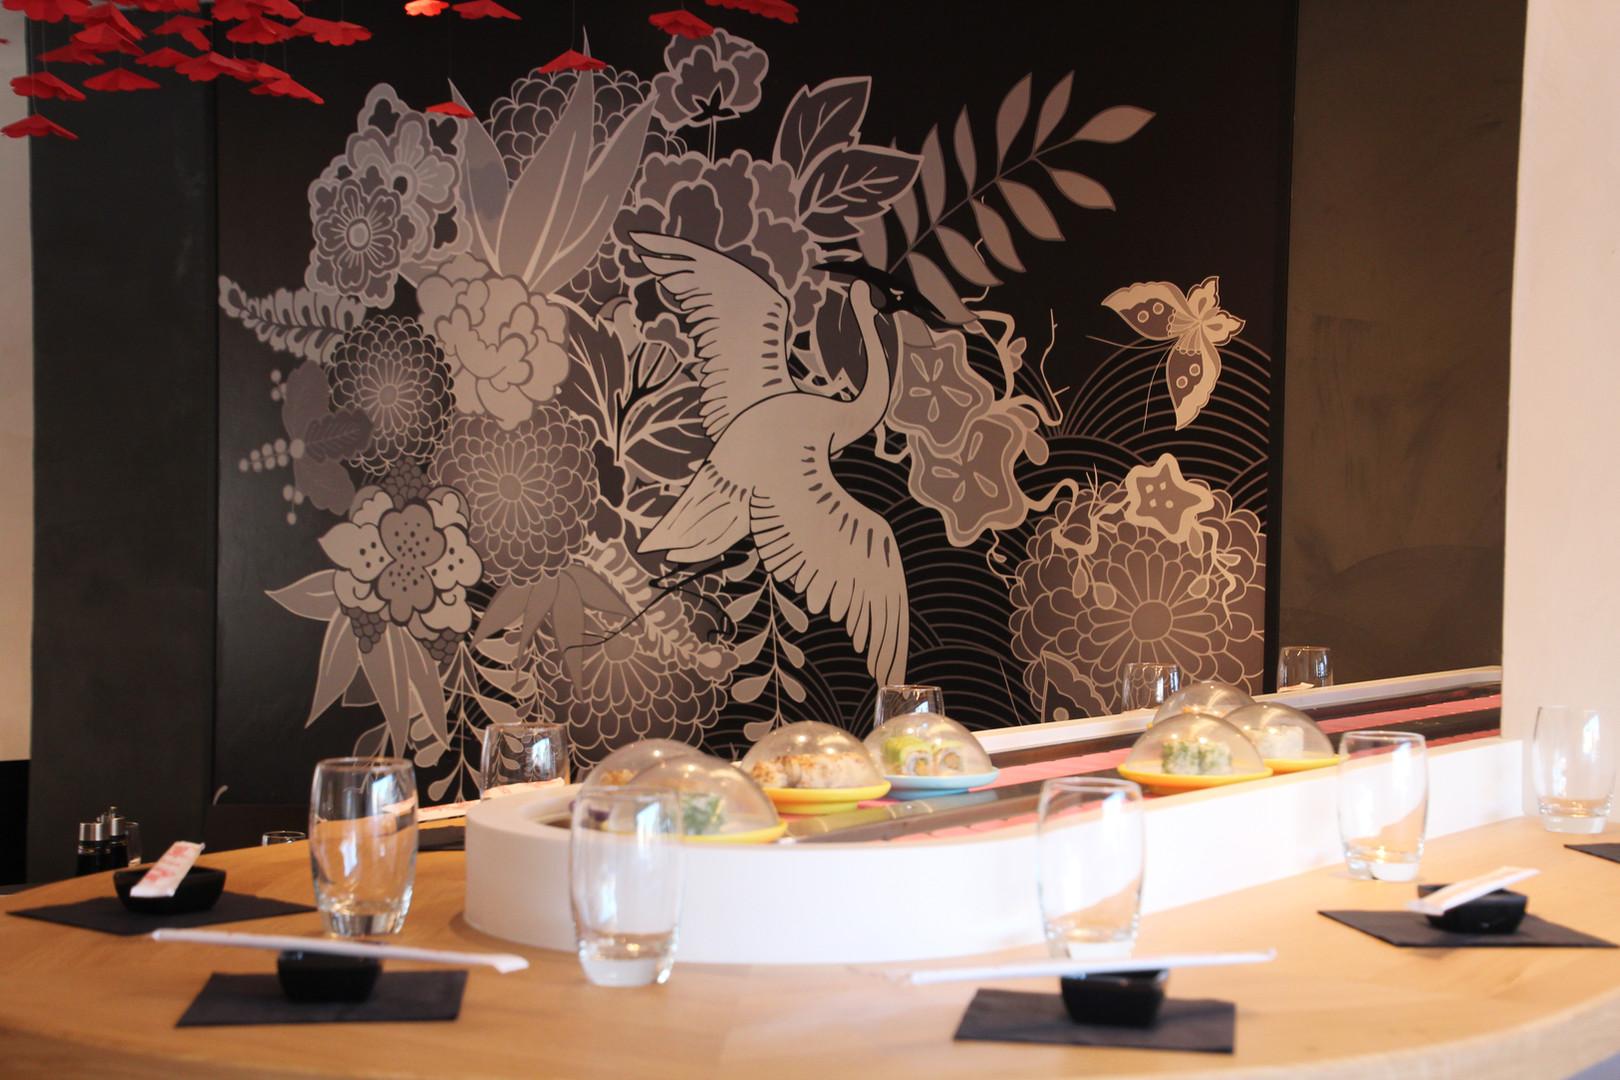 Le kaiten, tapis roulant - restaurant Yume Sushi à Strasbourg